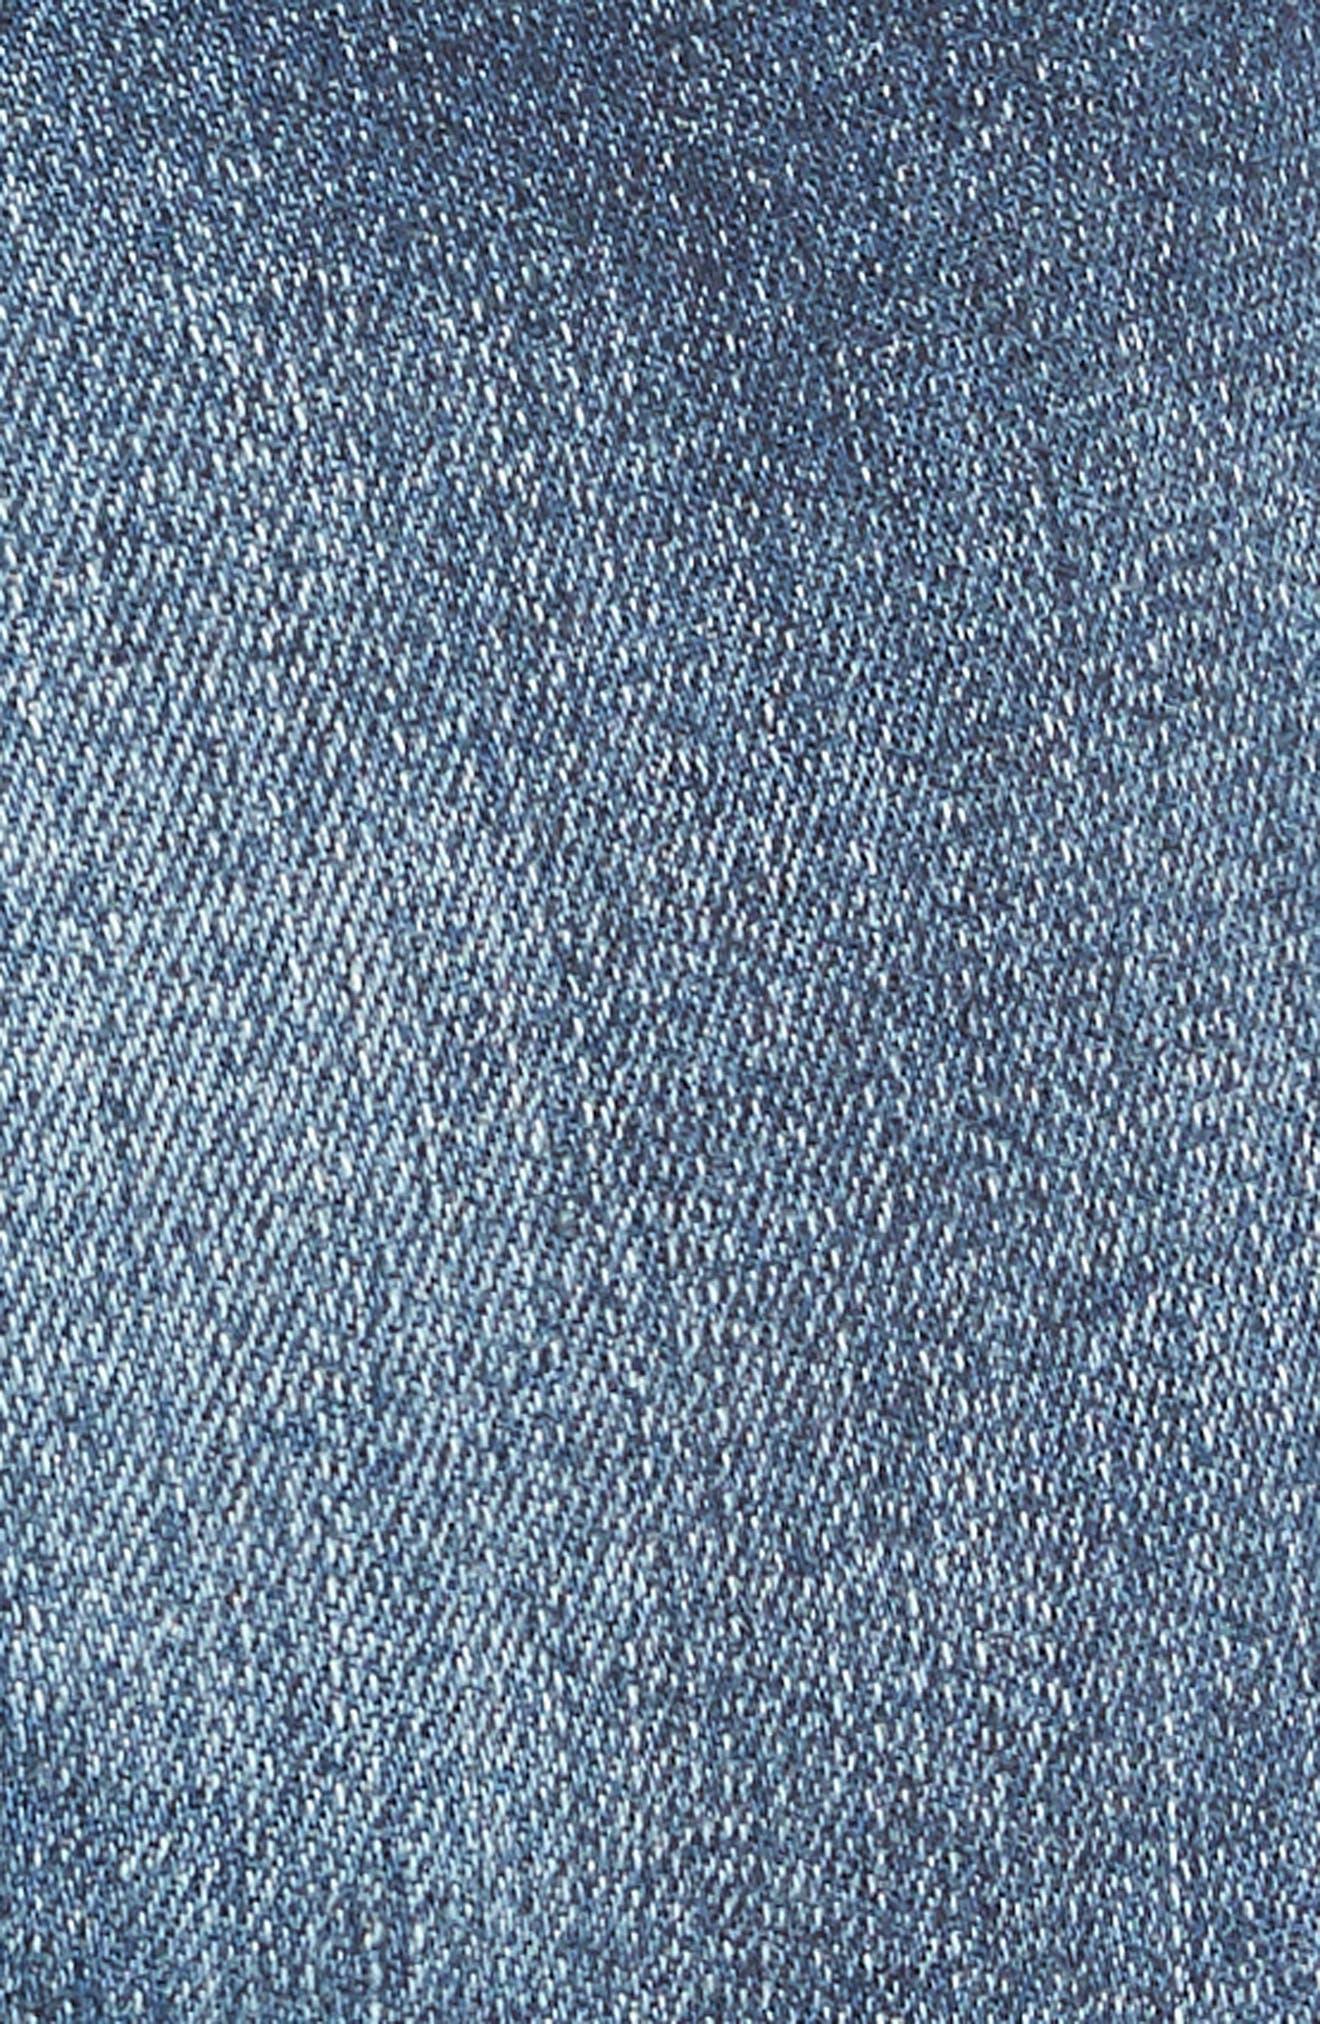 Cuffed High Waist Denim Shorts,                             Alternate thumbnail 5, color,                             401